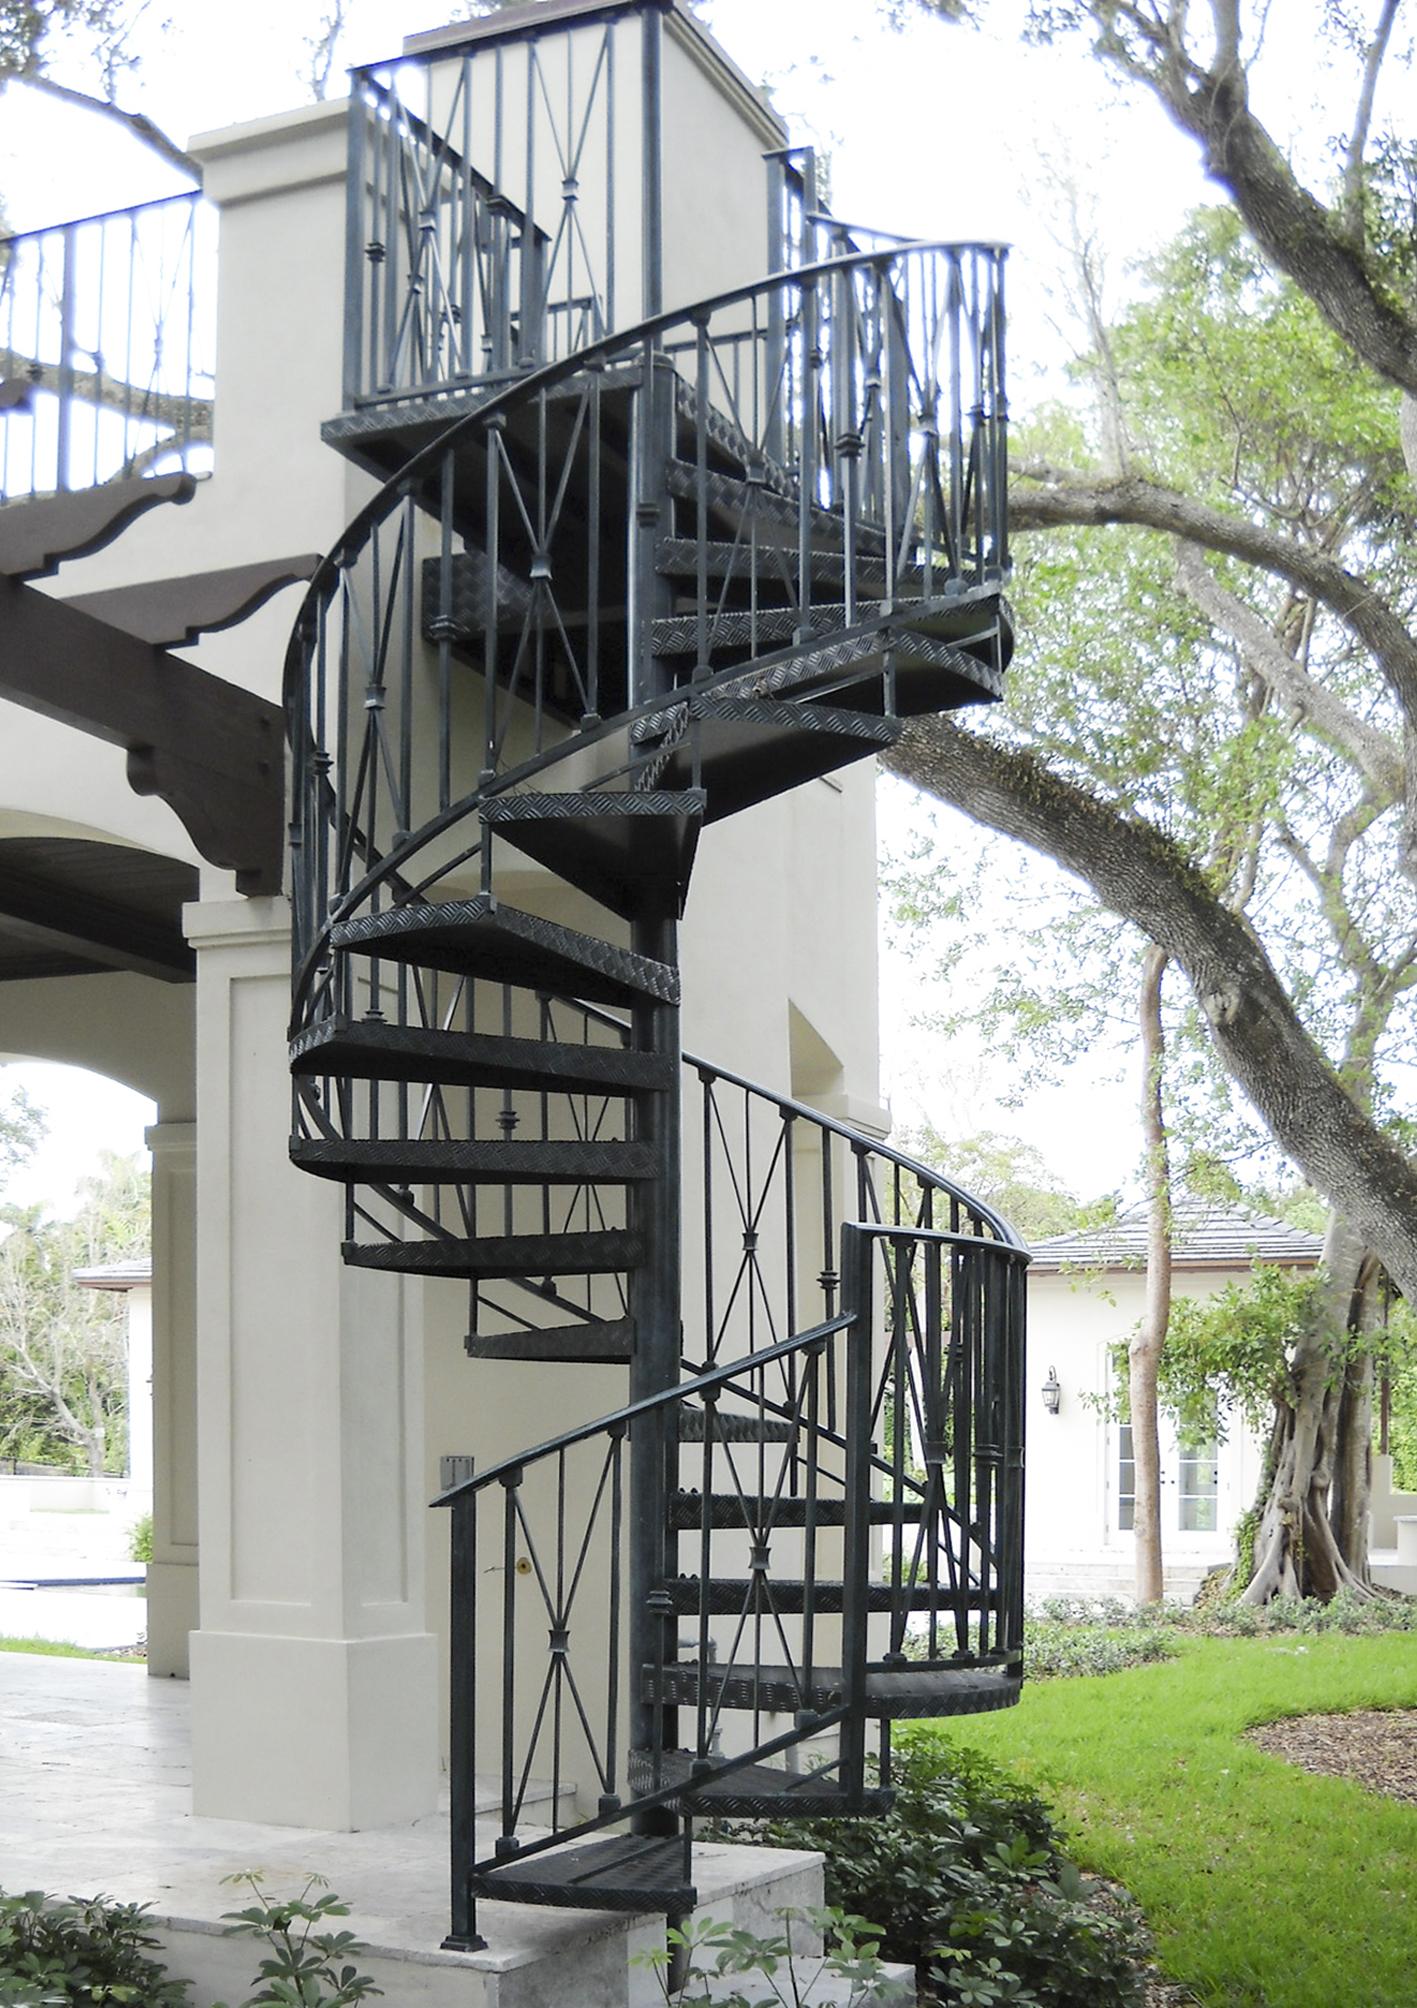 The Spiral Stair Attraction - Belt Atelier